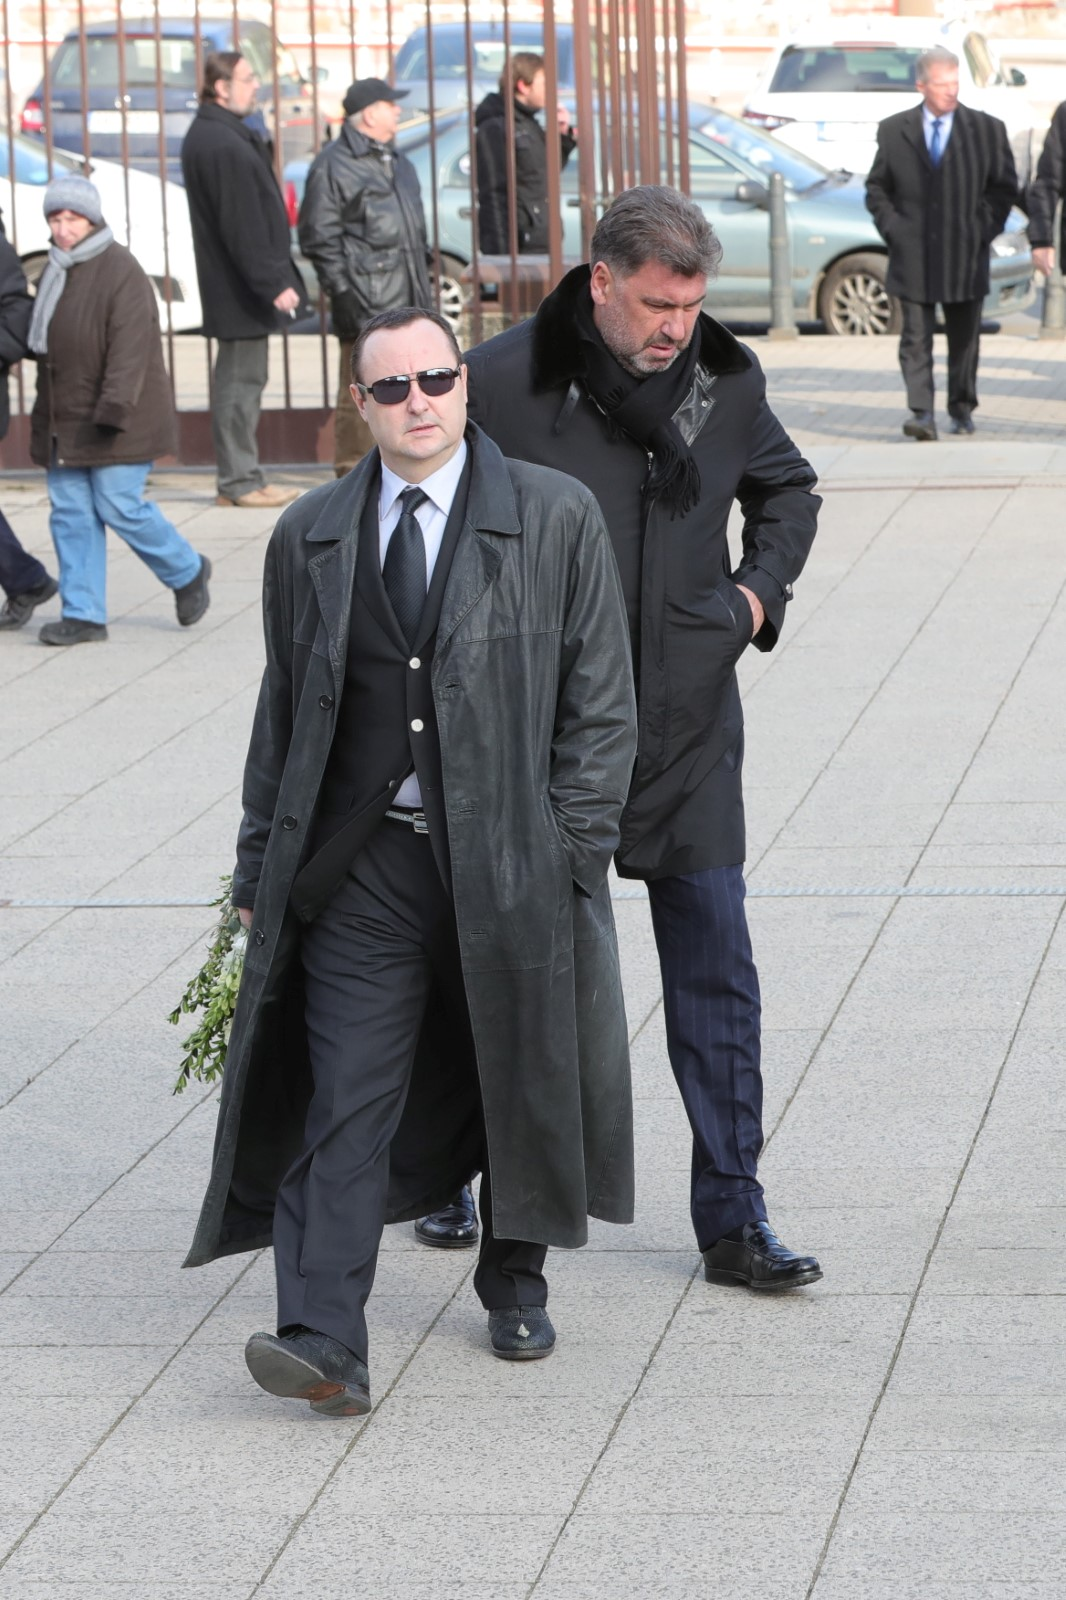 Na pohřeb Miroslava Šloufa dorazili Zemanův poradce Martin Nejedlý a lobbista Tomáš Hrdlička (24.2.2018)